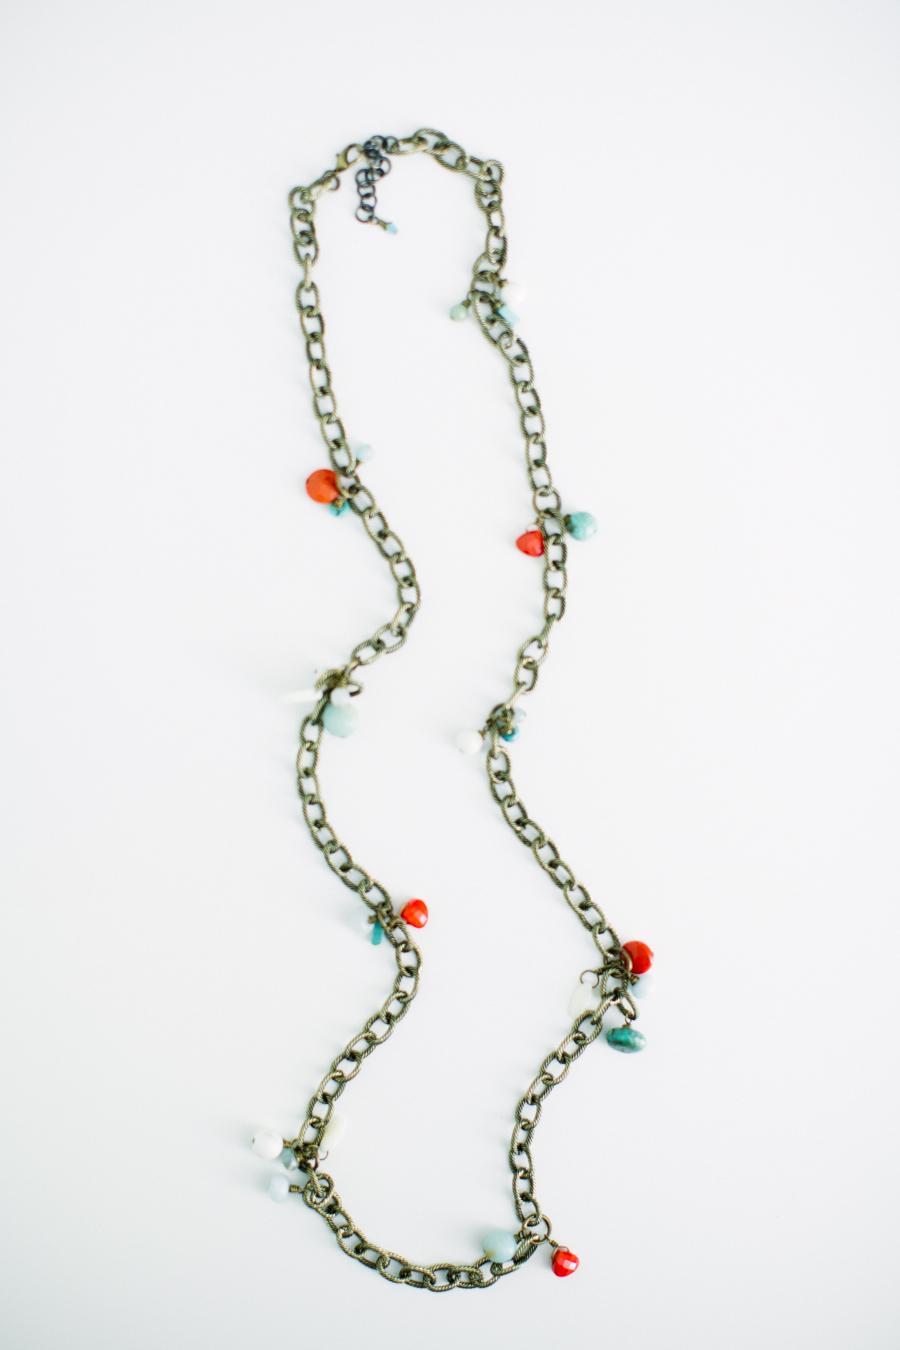 Jewelry-MackenzieKern-17.jpg